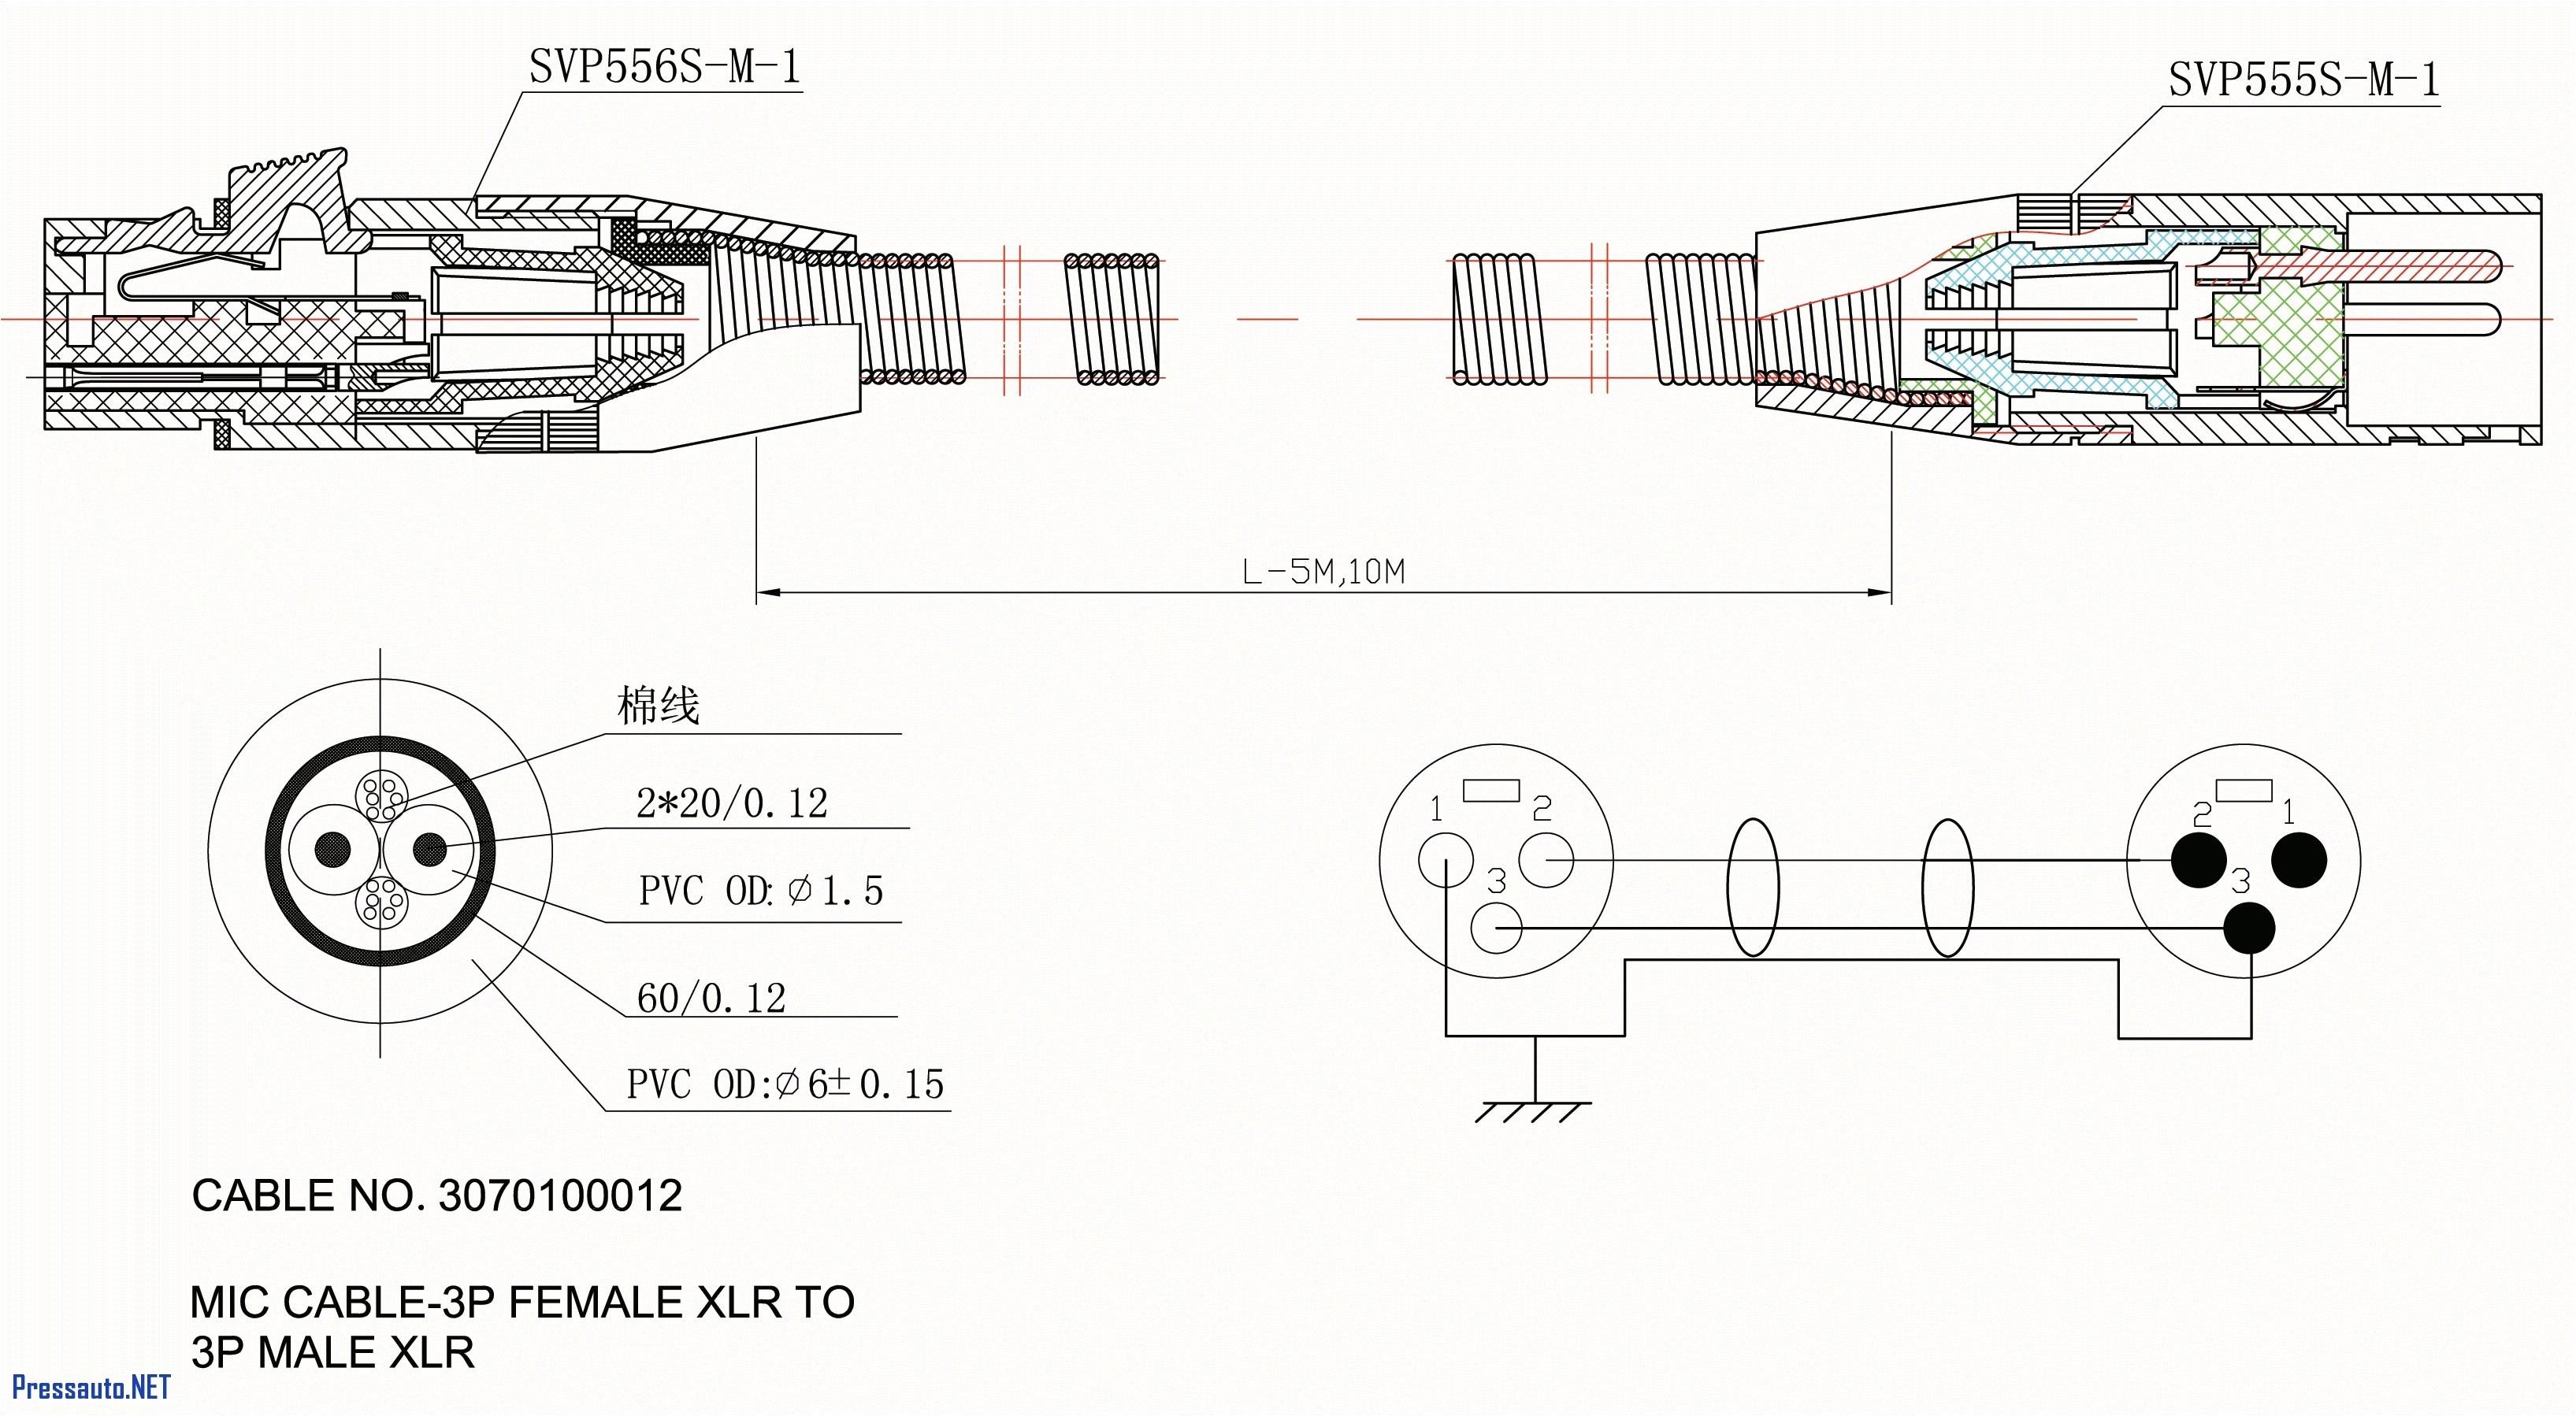 Cal Amp Wiring Diagram Cal Amp Wiring Wiring Diagram Ebook